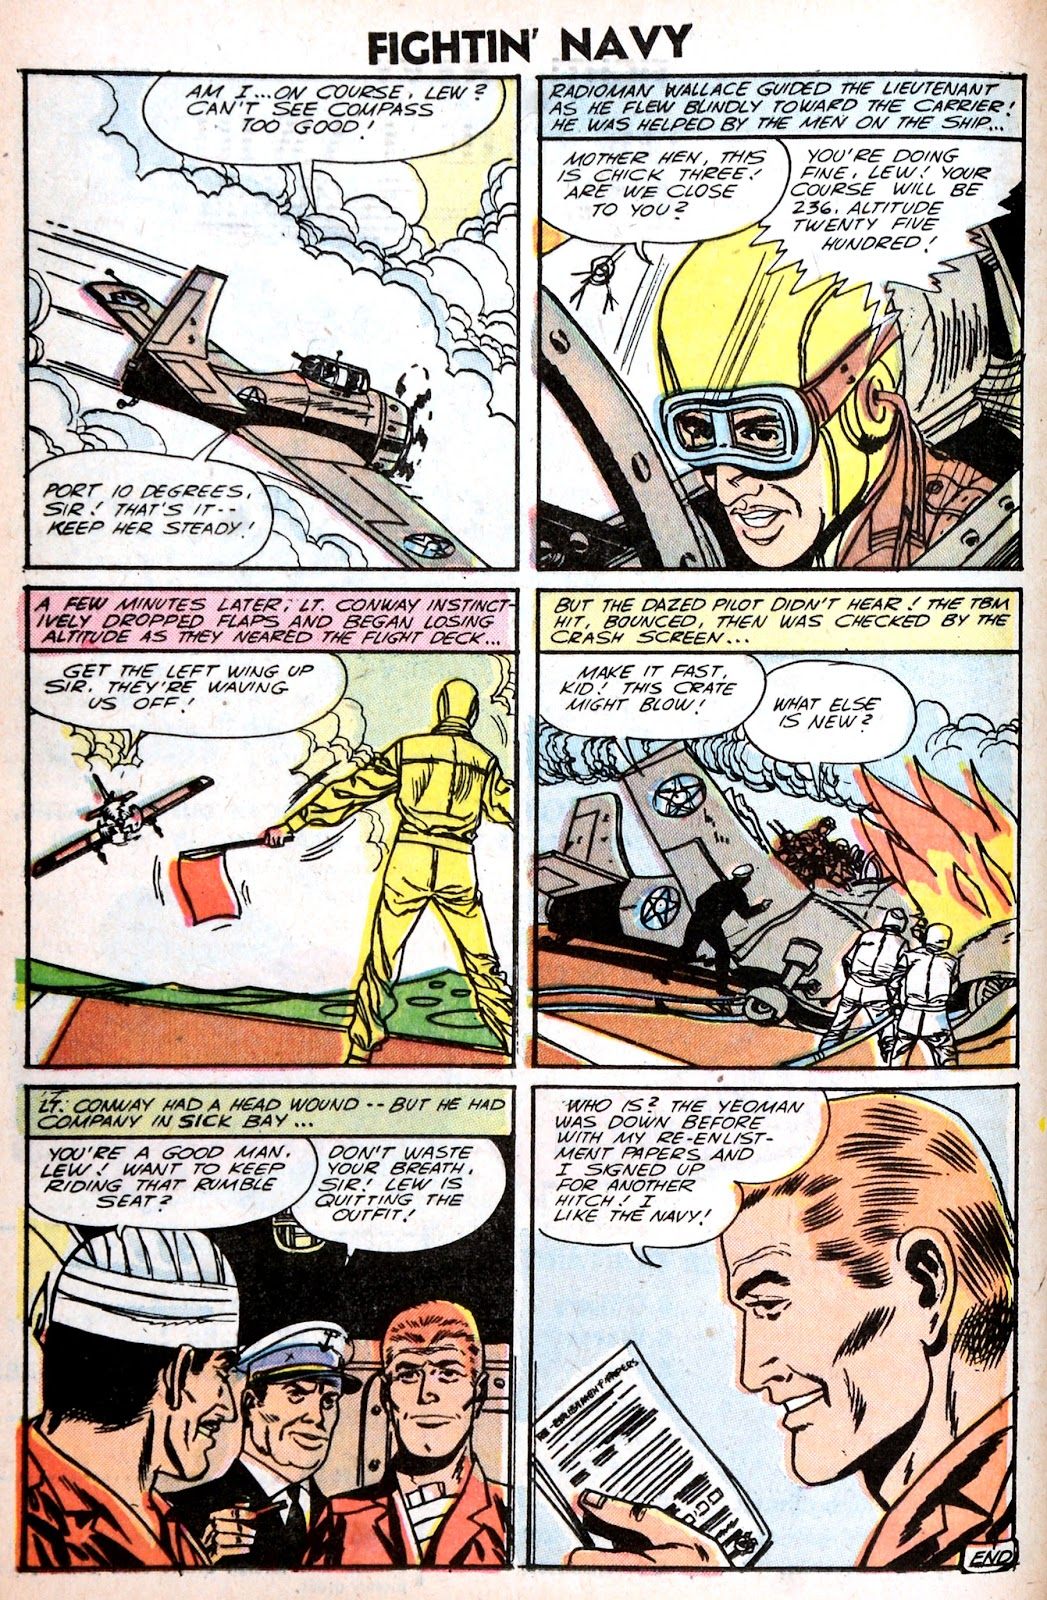 Read online Fightin' Navy comic -  Issue #75 - 16